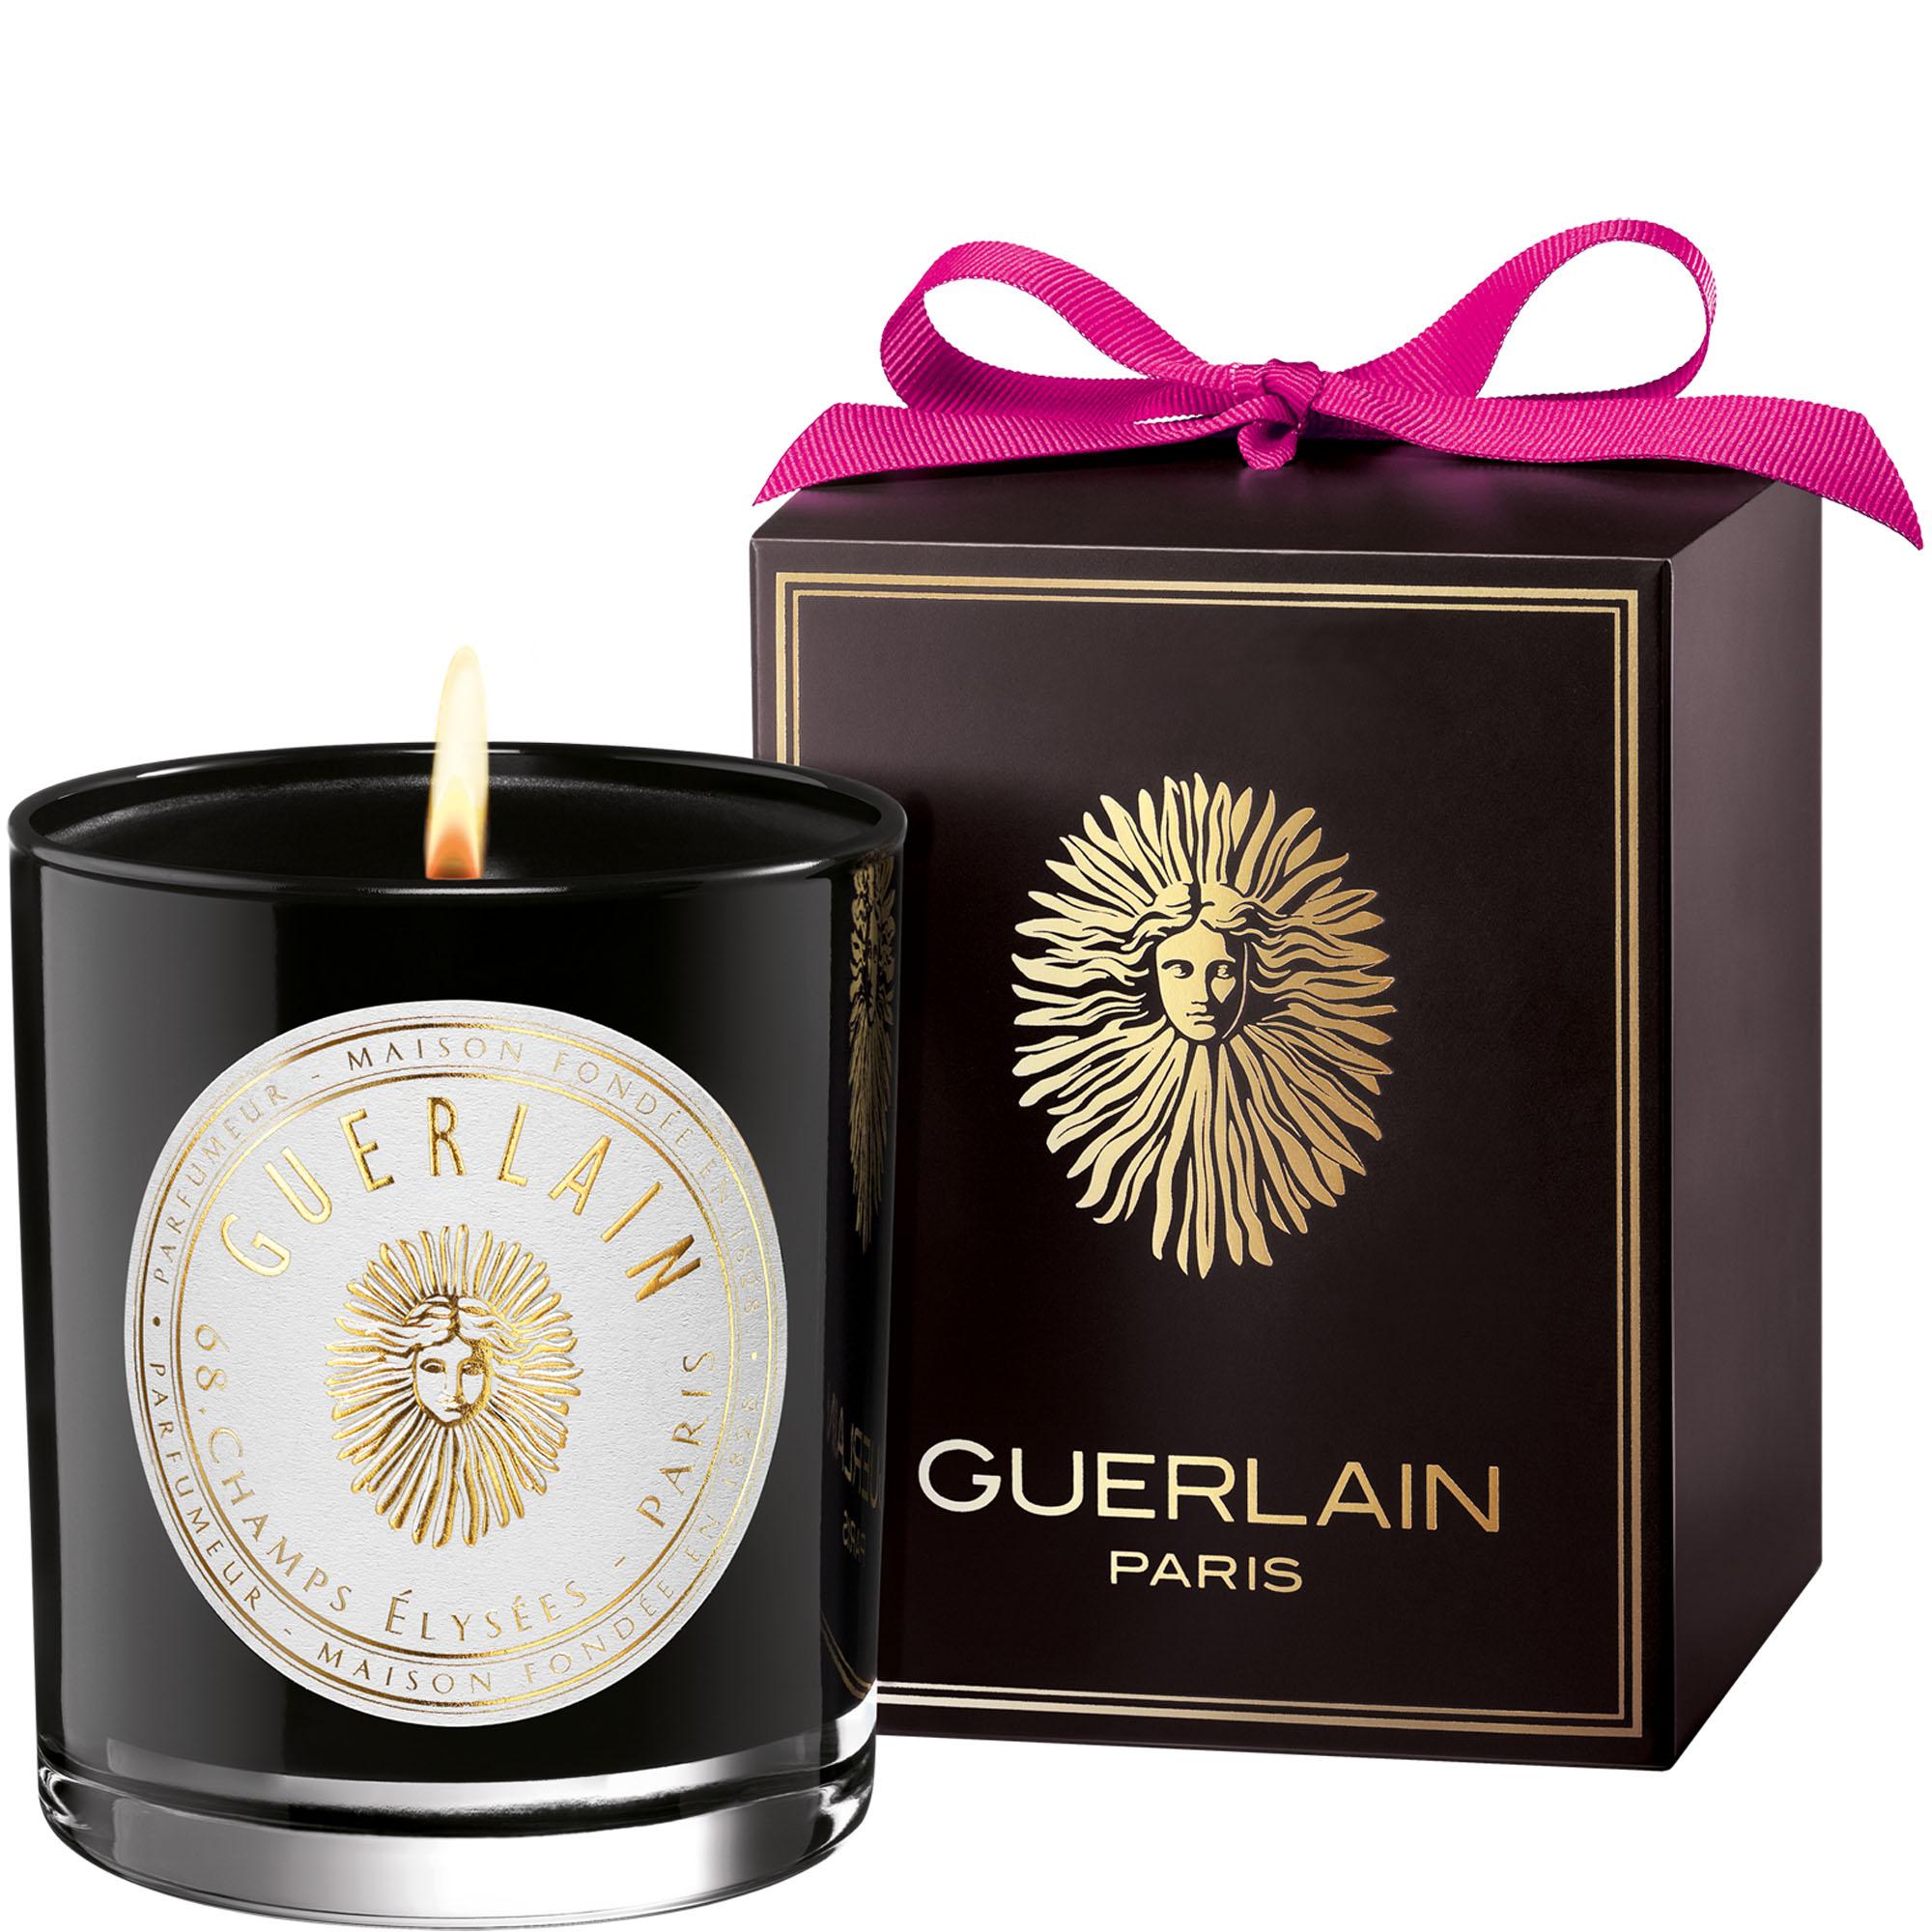 Guerlain-Candle-Box.jpg